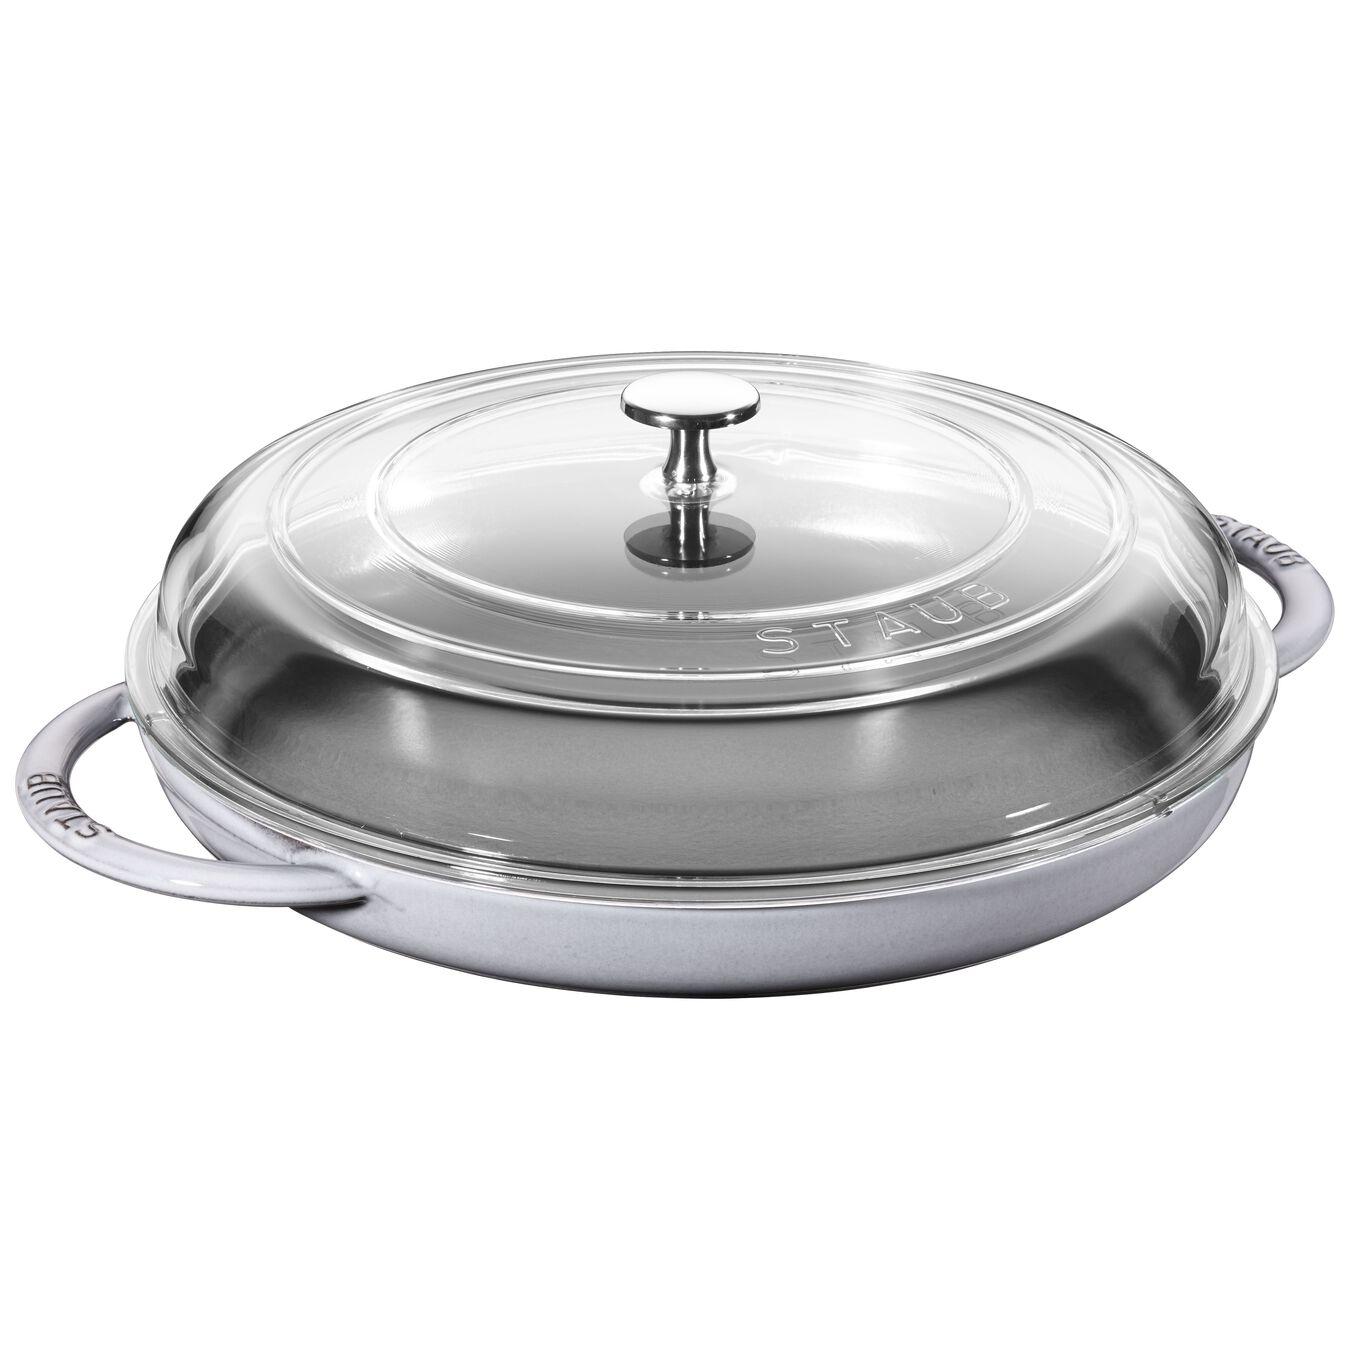 12-inch Round Steam Griddle - Graphite Grey,,large 1